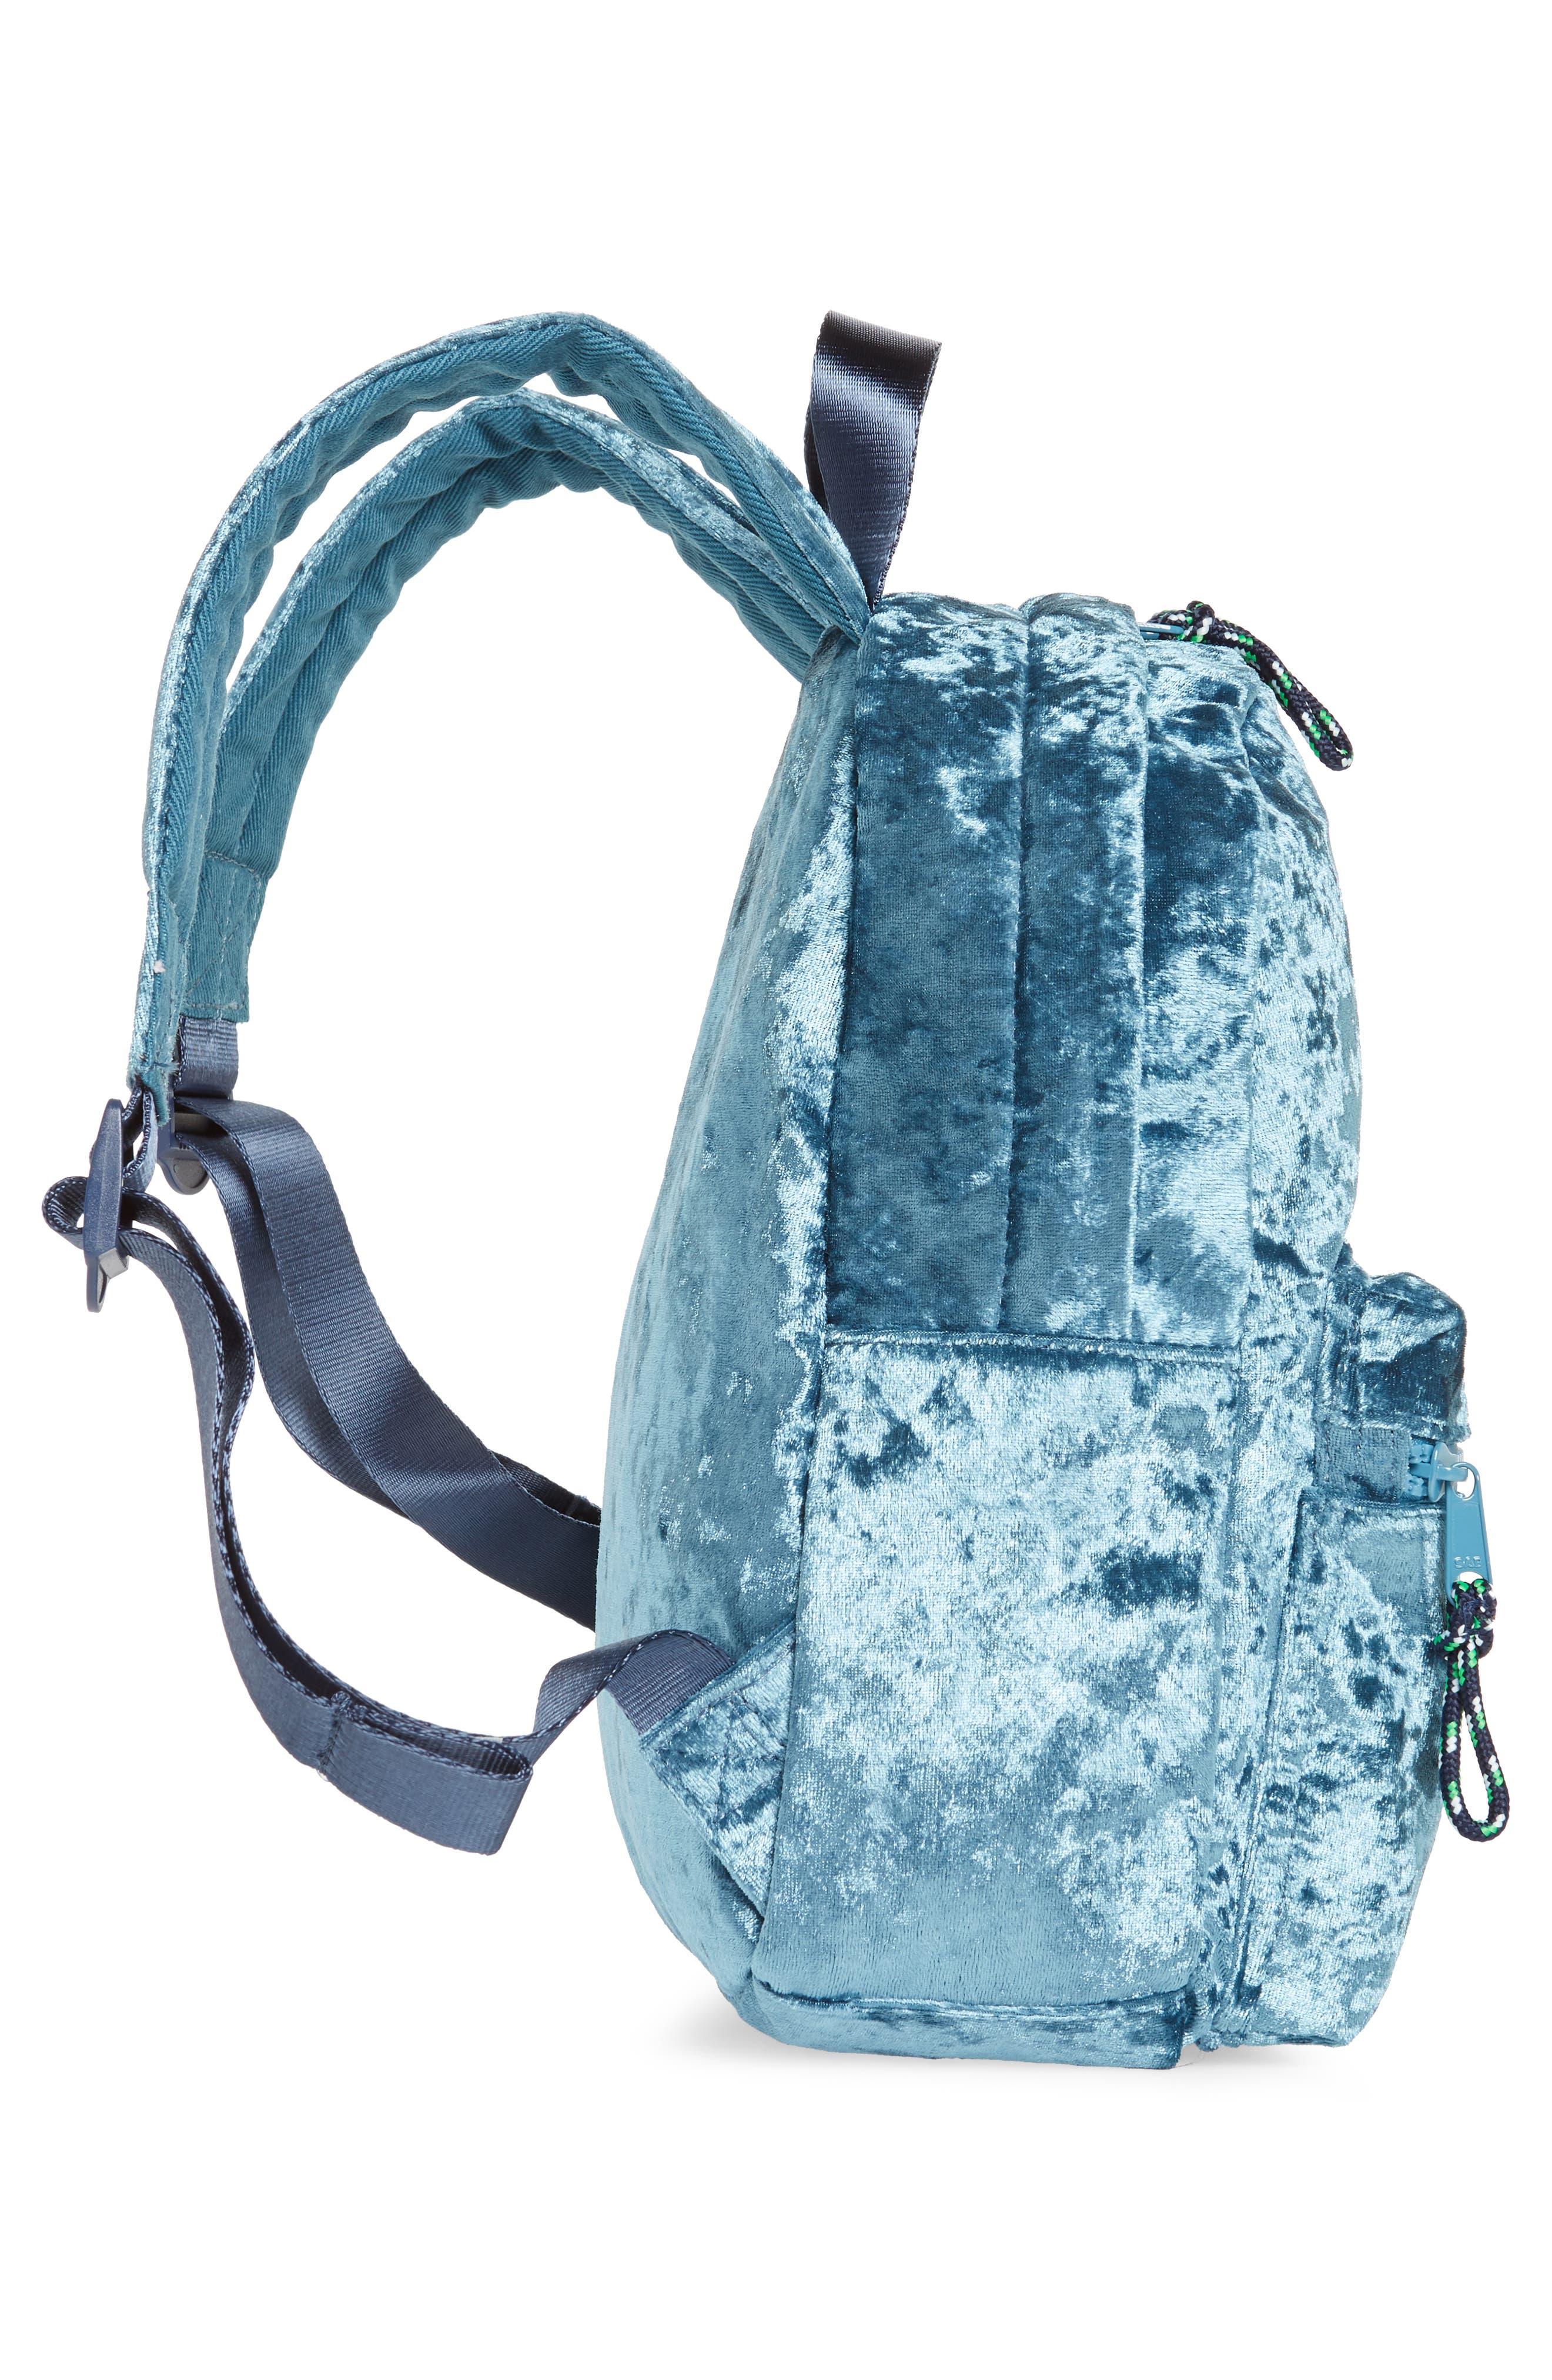 Crushed Velvet Backpack,                             Alternate thumbnail 3, color,                             Brilliant Turquoise